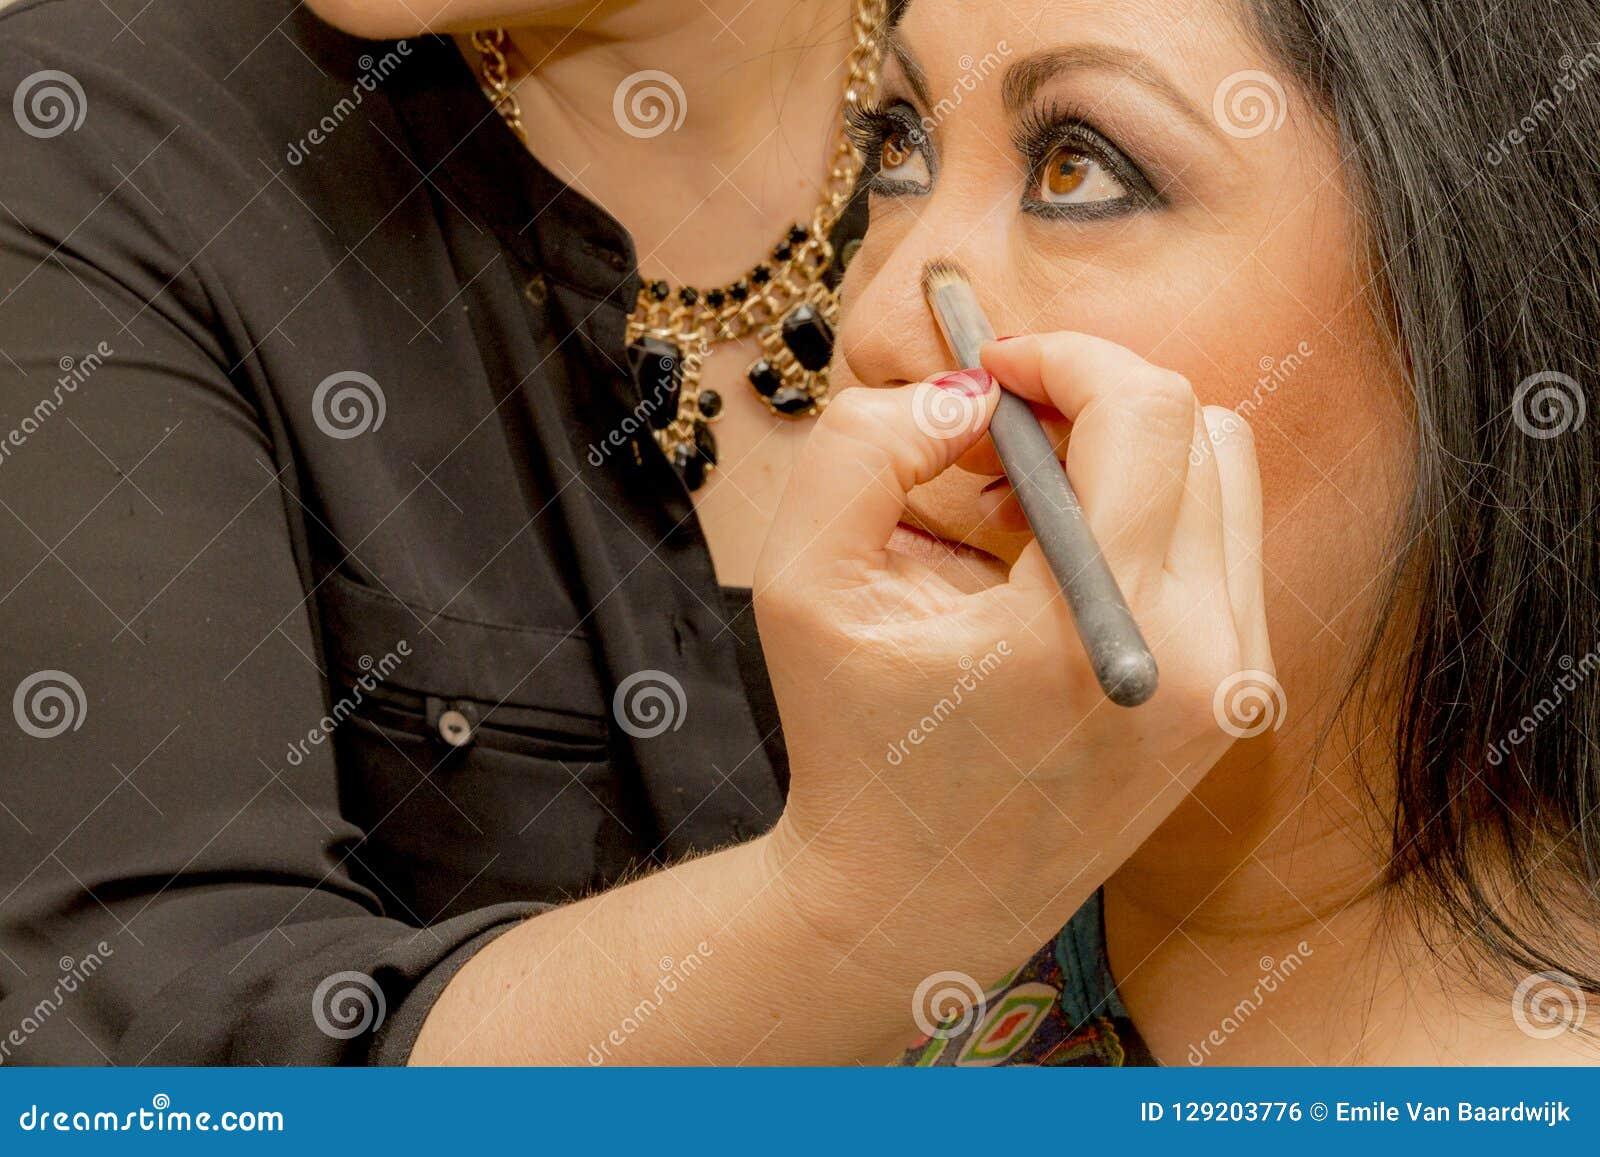 Maquillaje la nariz en un maquillaje profesional